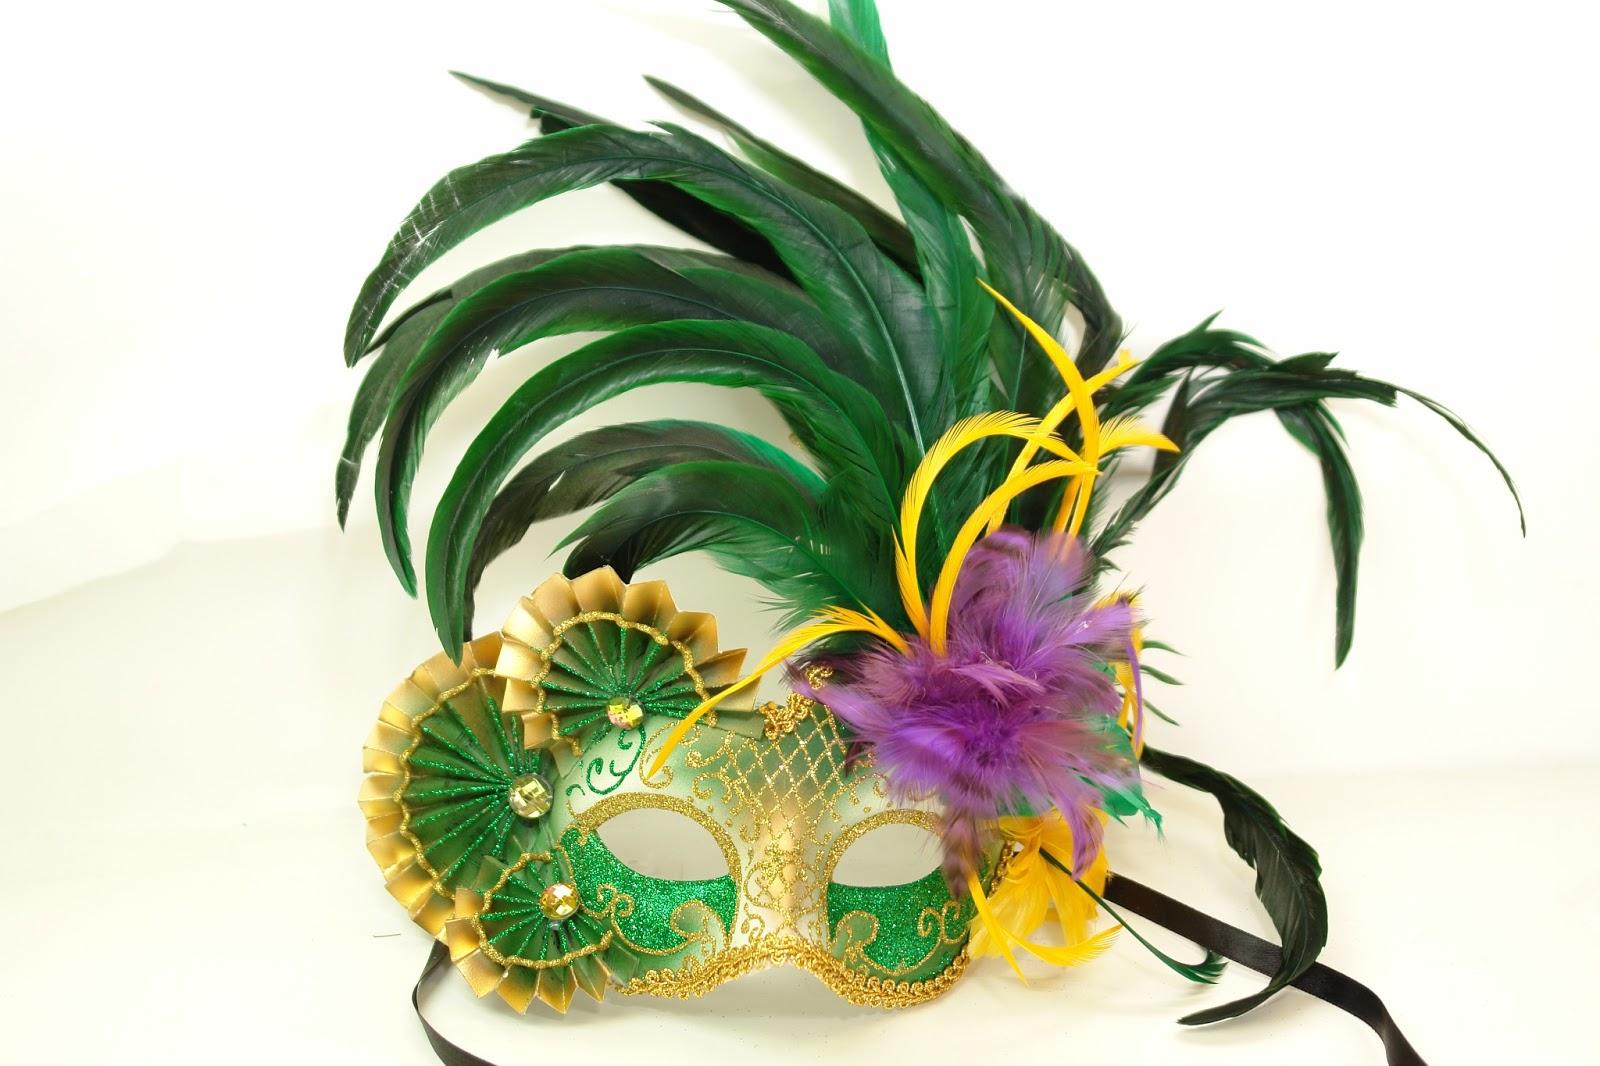 Beautiful mardi gras masks 2013 colorful mardi gras masks mardi gras - Free mardi gras pics ...